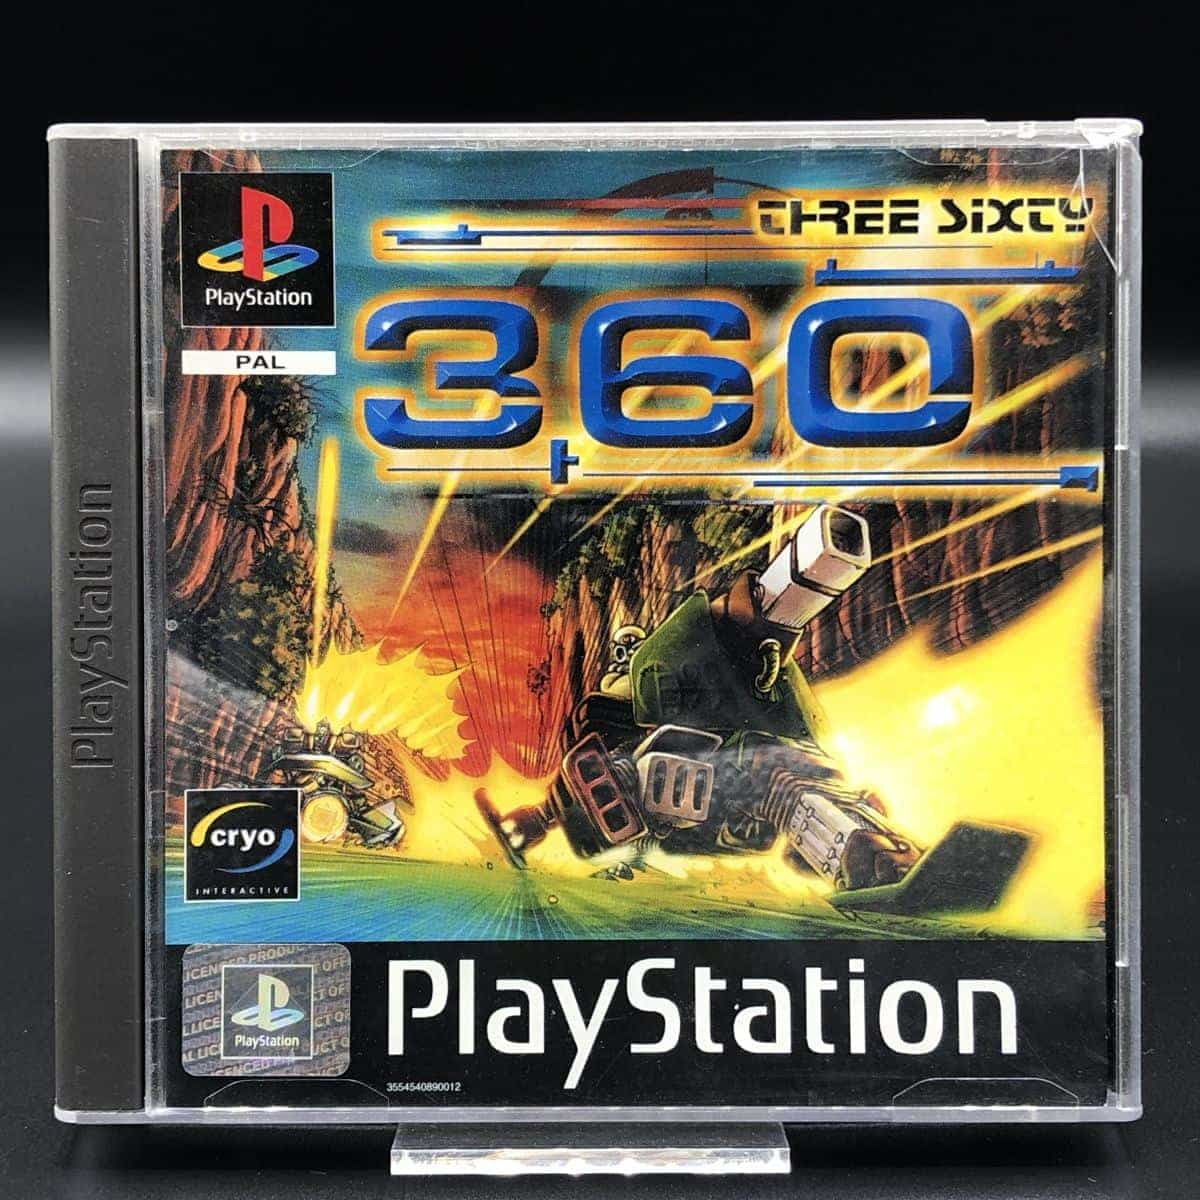 PS1 360: Three Sixty (Komplett) (Gut) Sony PlayStation 1